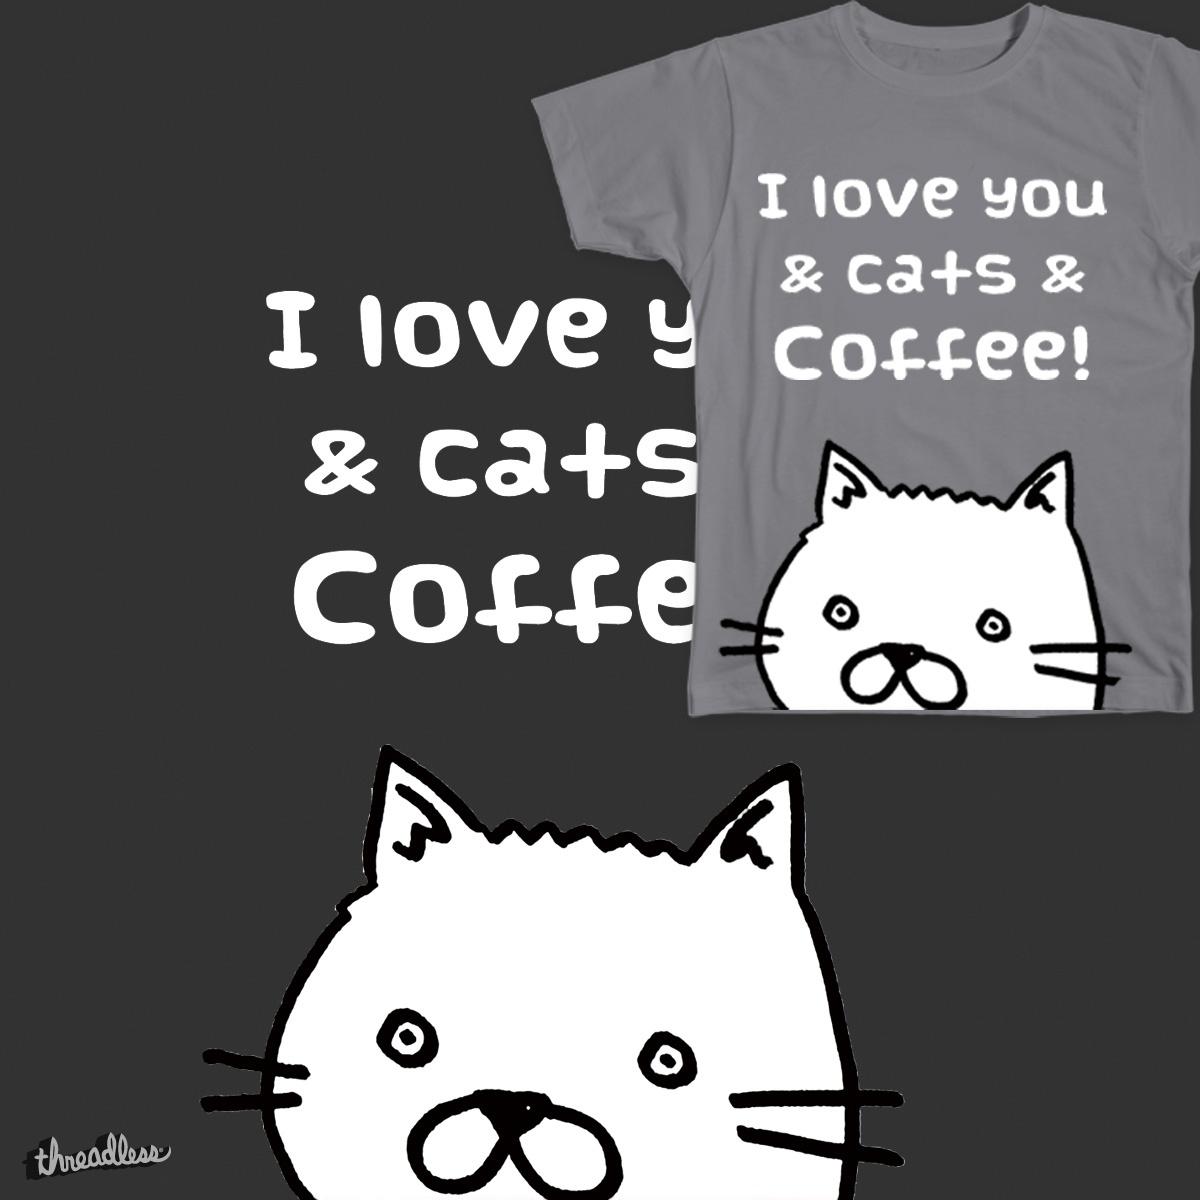 love cats&coffee by KaoriSakata on Threadless